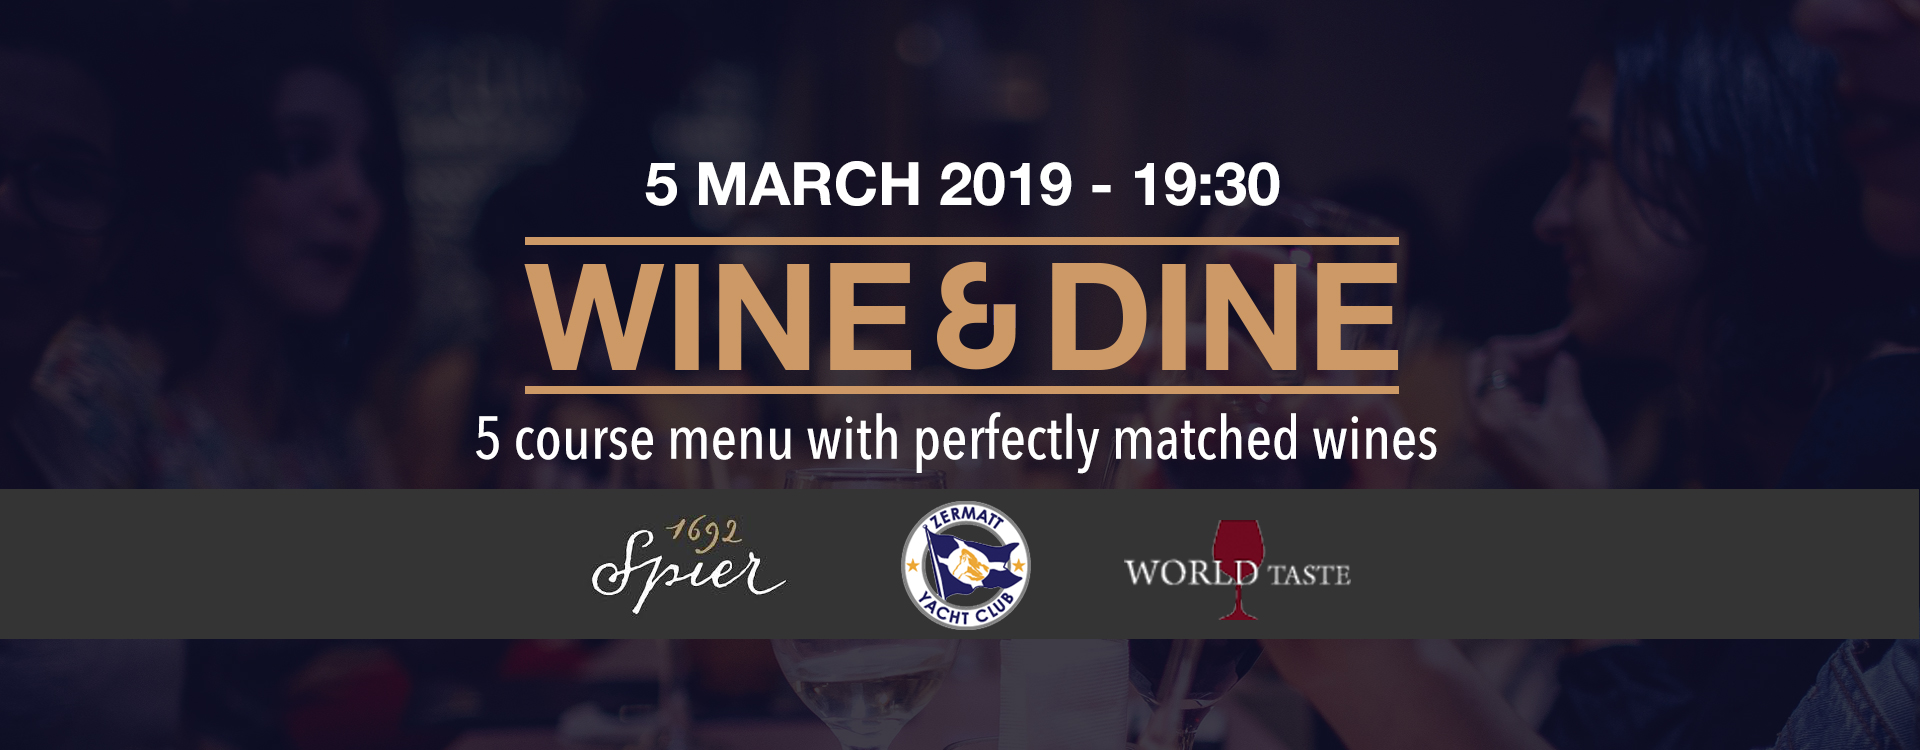 zermatt_snowboat_wine_and_dine_event_02